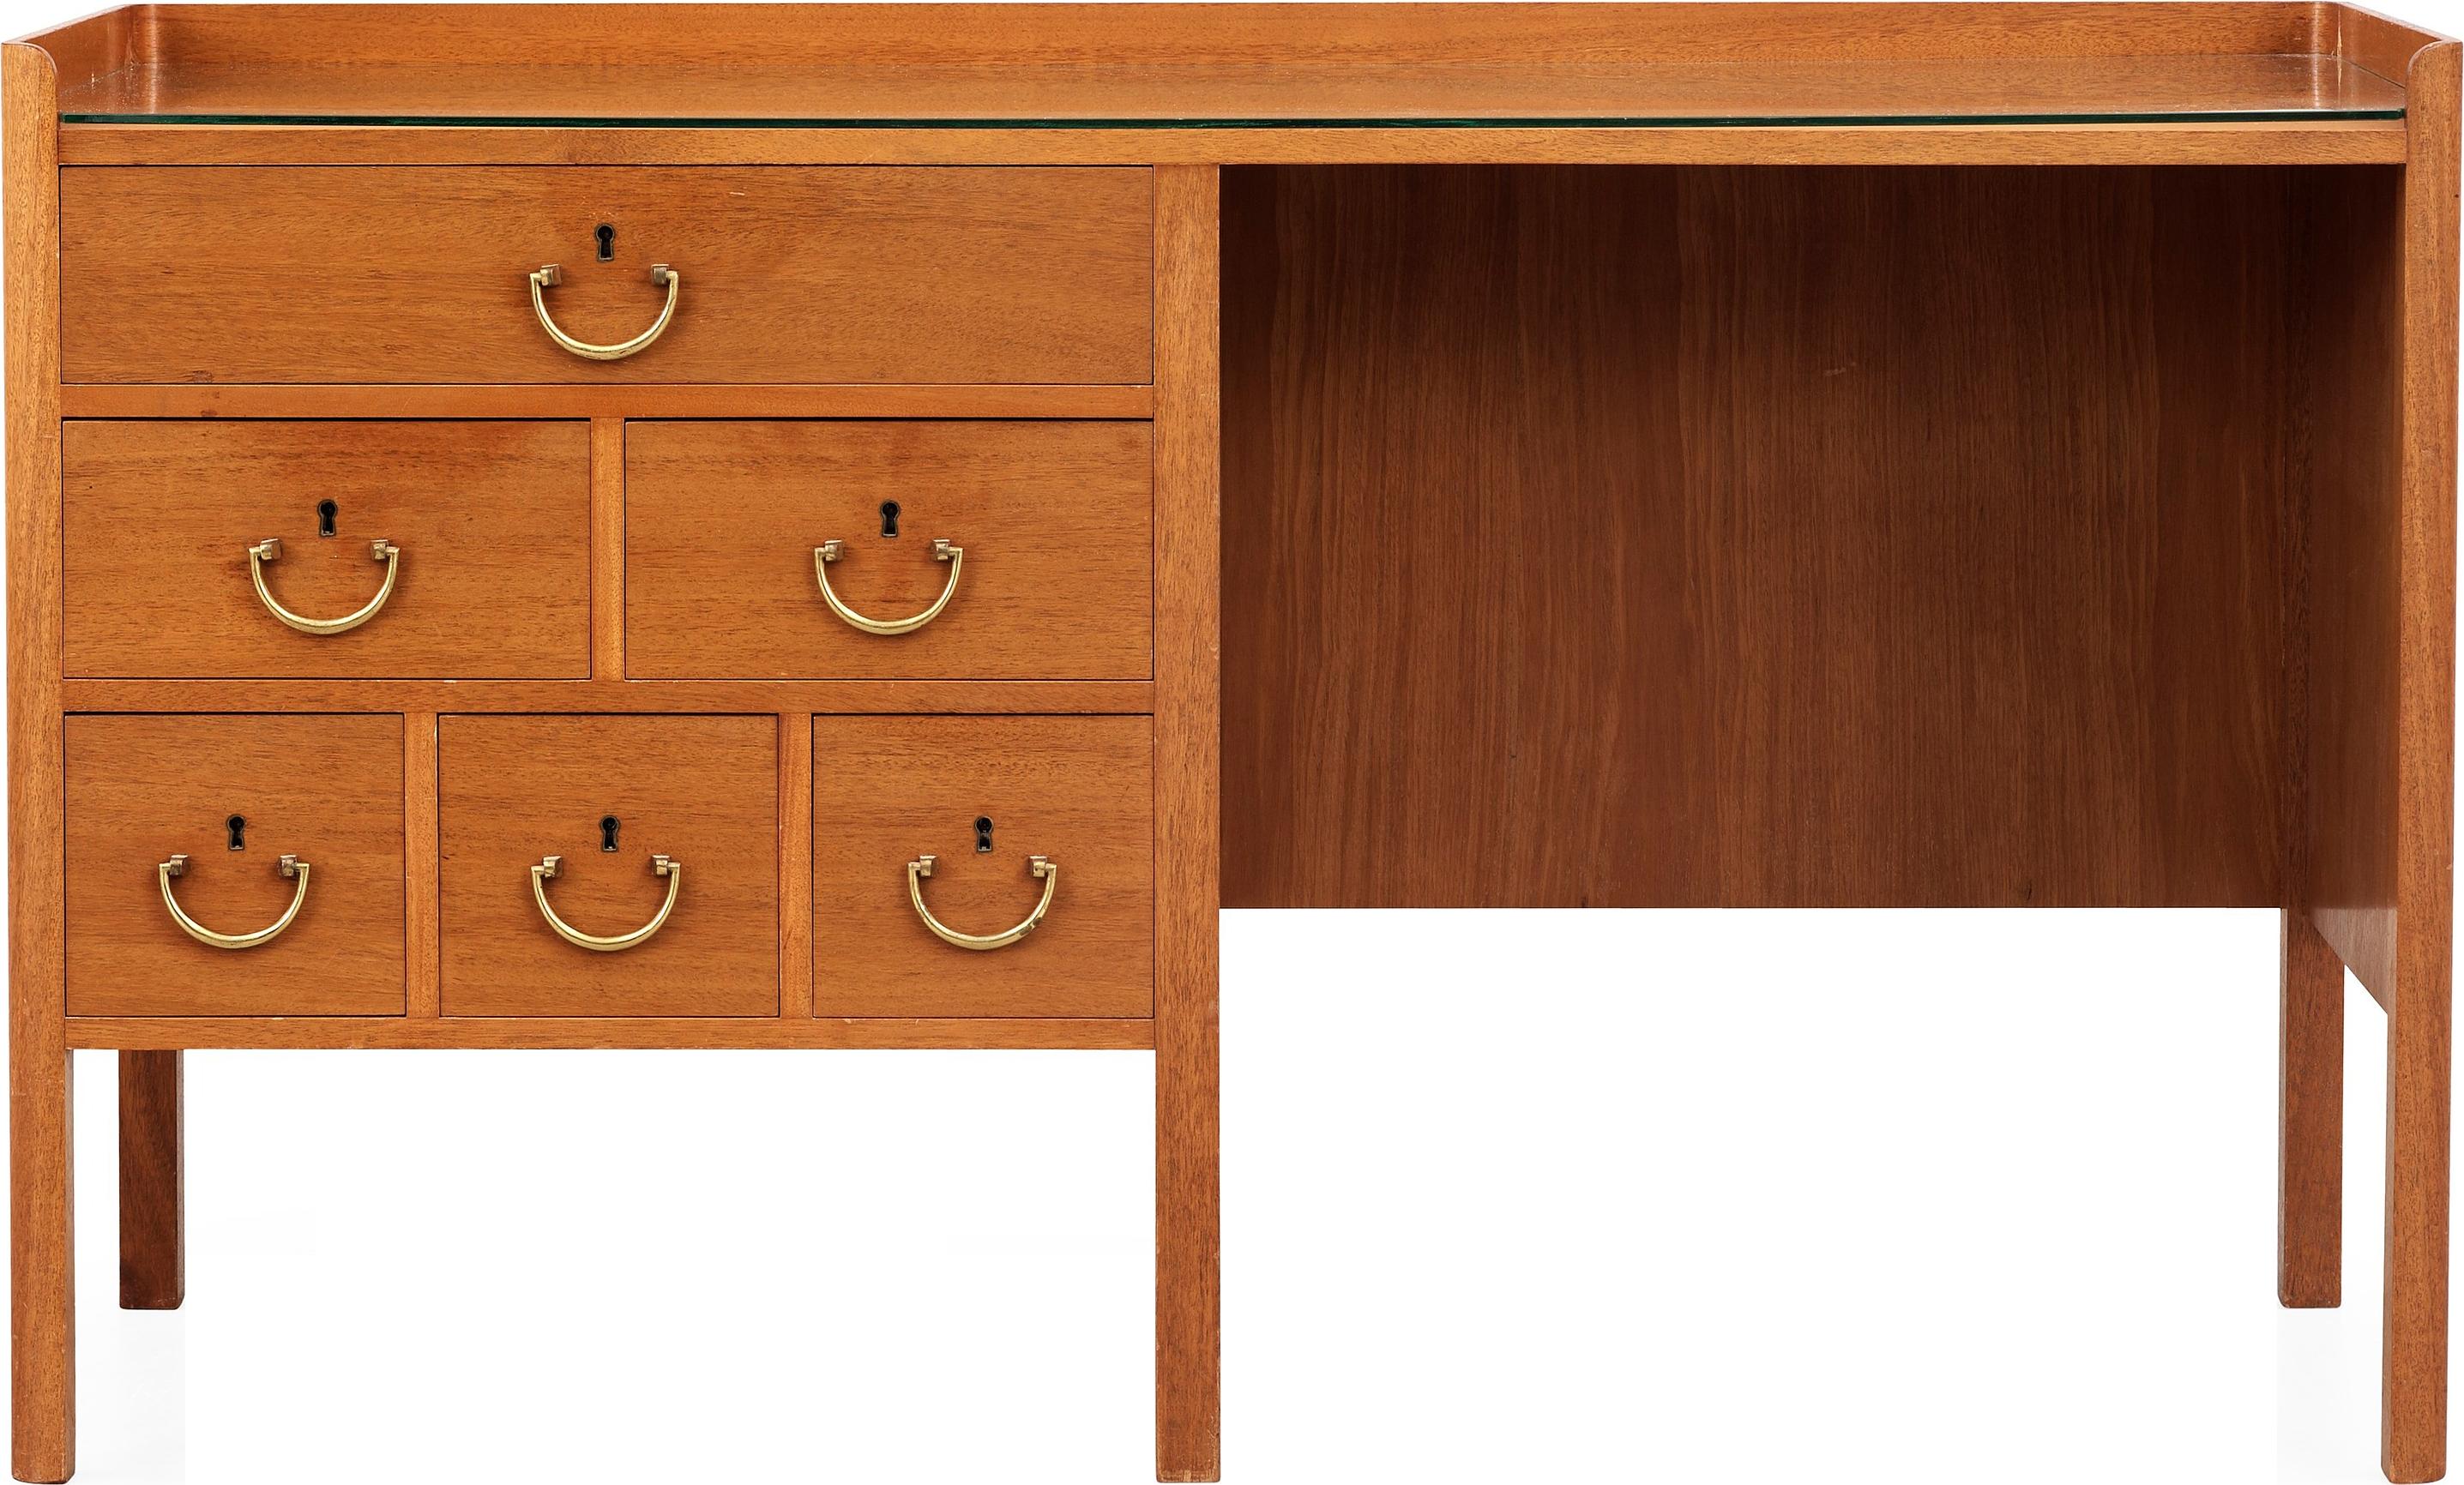 Desk clipart wood desk. Wooden table png image